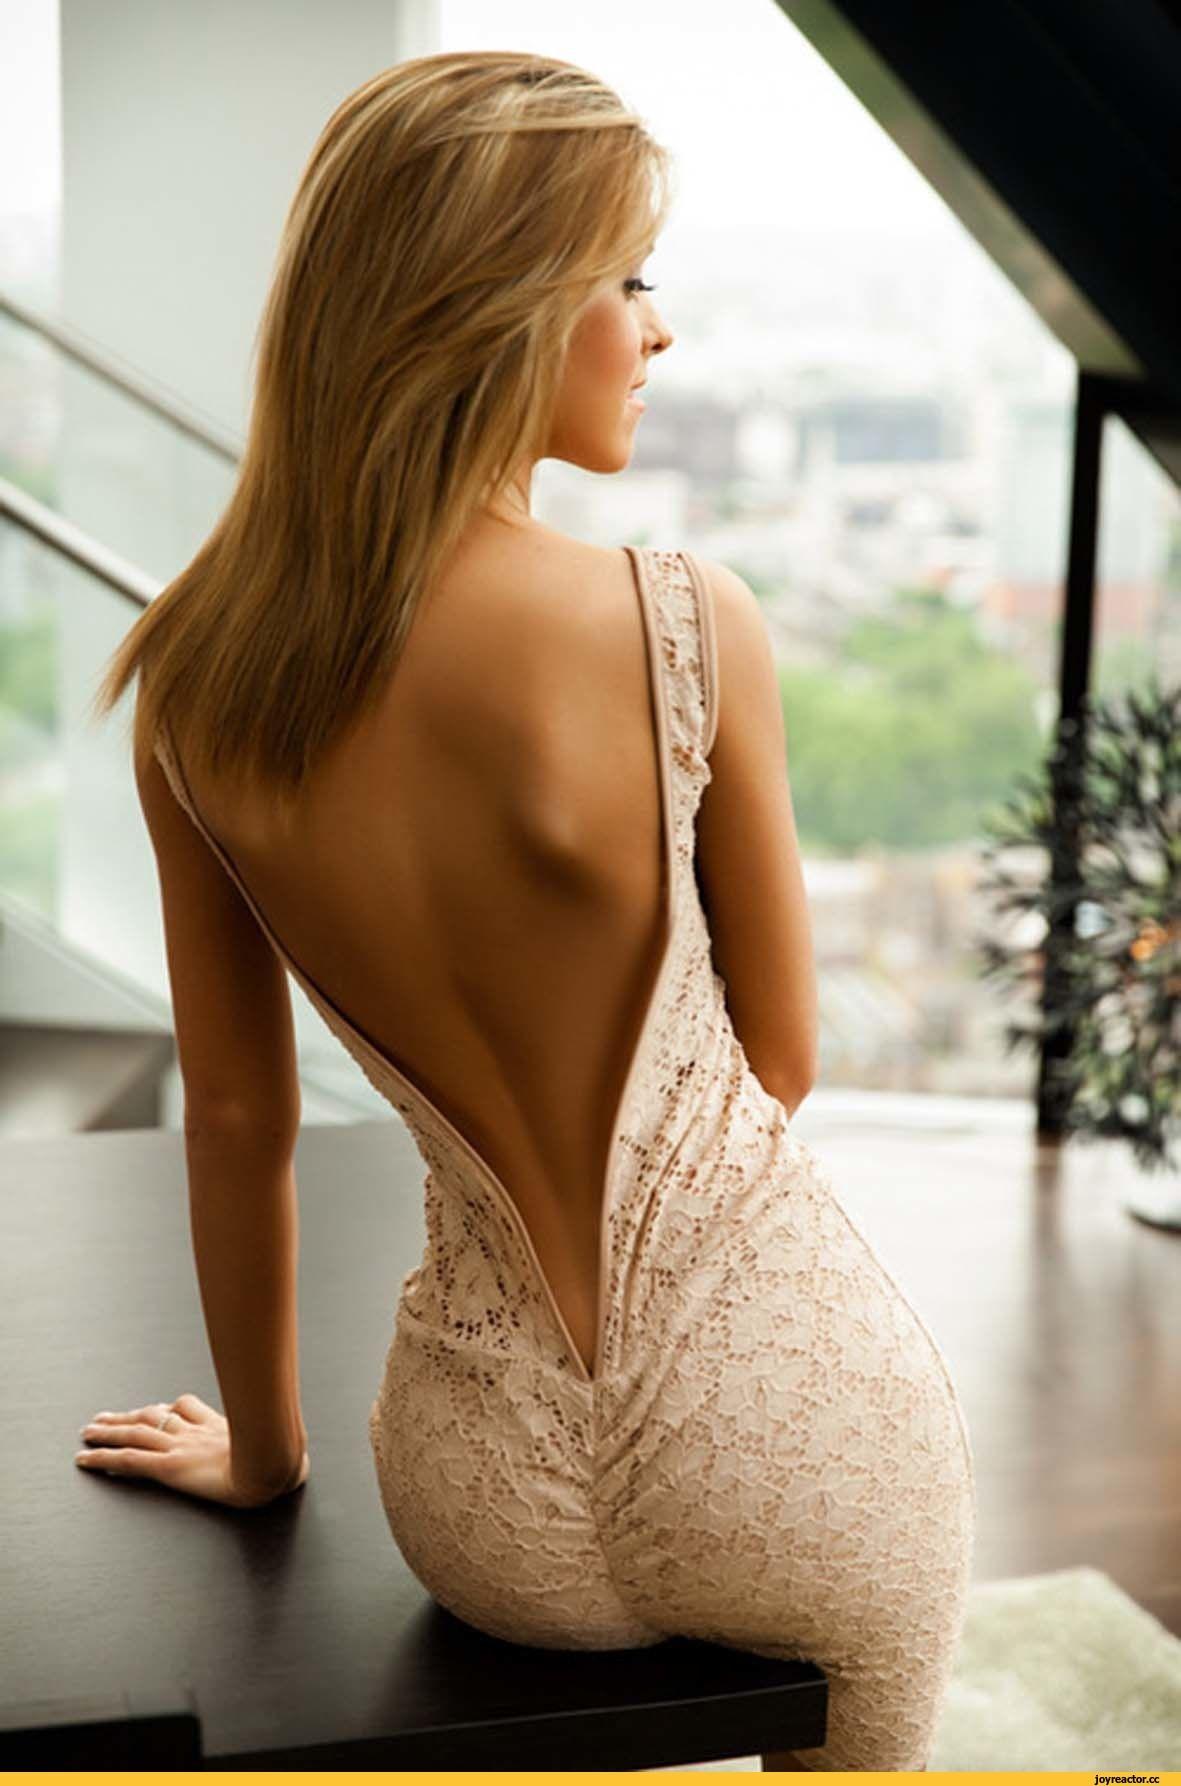 Undergarments for open back wedding dress  AlinaTomasevic Pinterest uc   love life